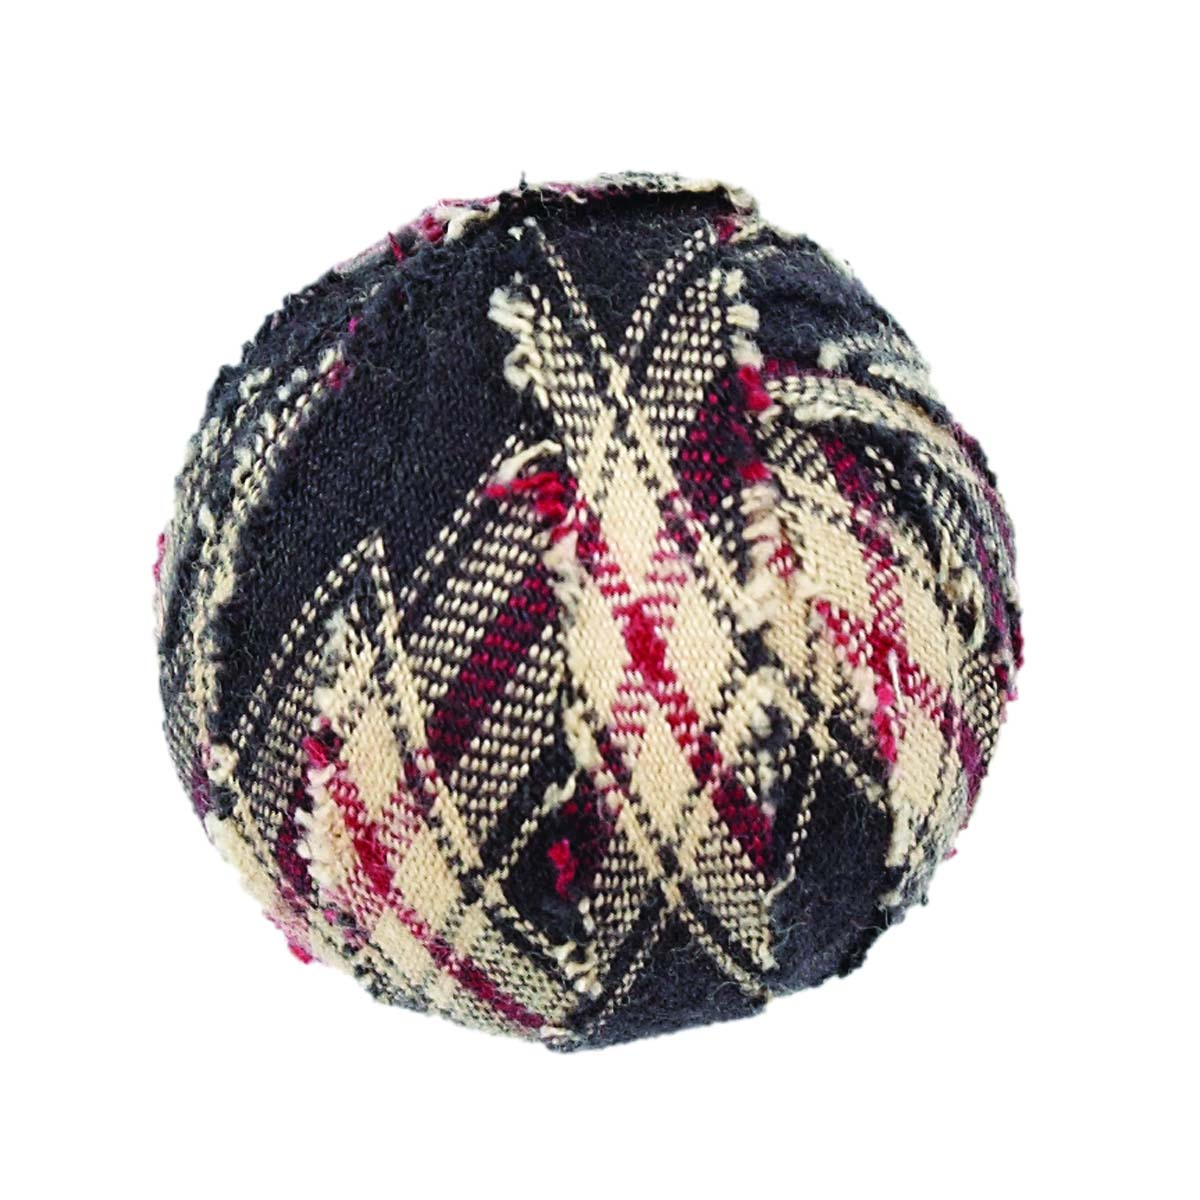 Bingham Star Fabric Ball #1-1.5